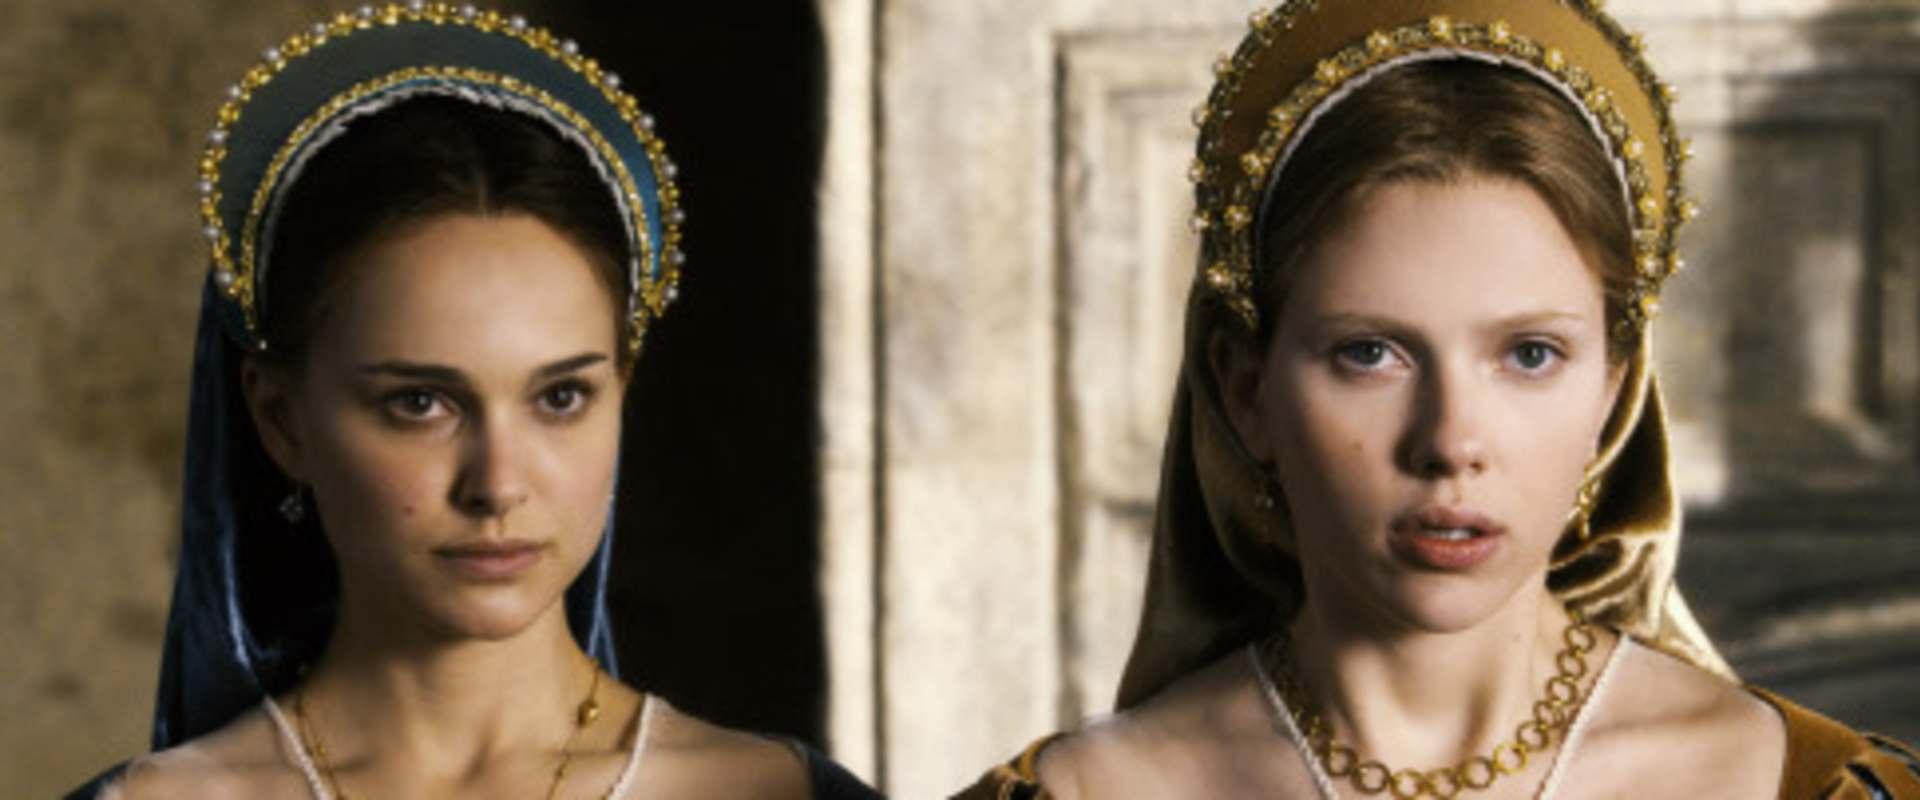 Watch The Other Boleyn Girl on Netflix Today! | NetflixMovies.com